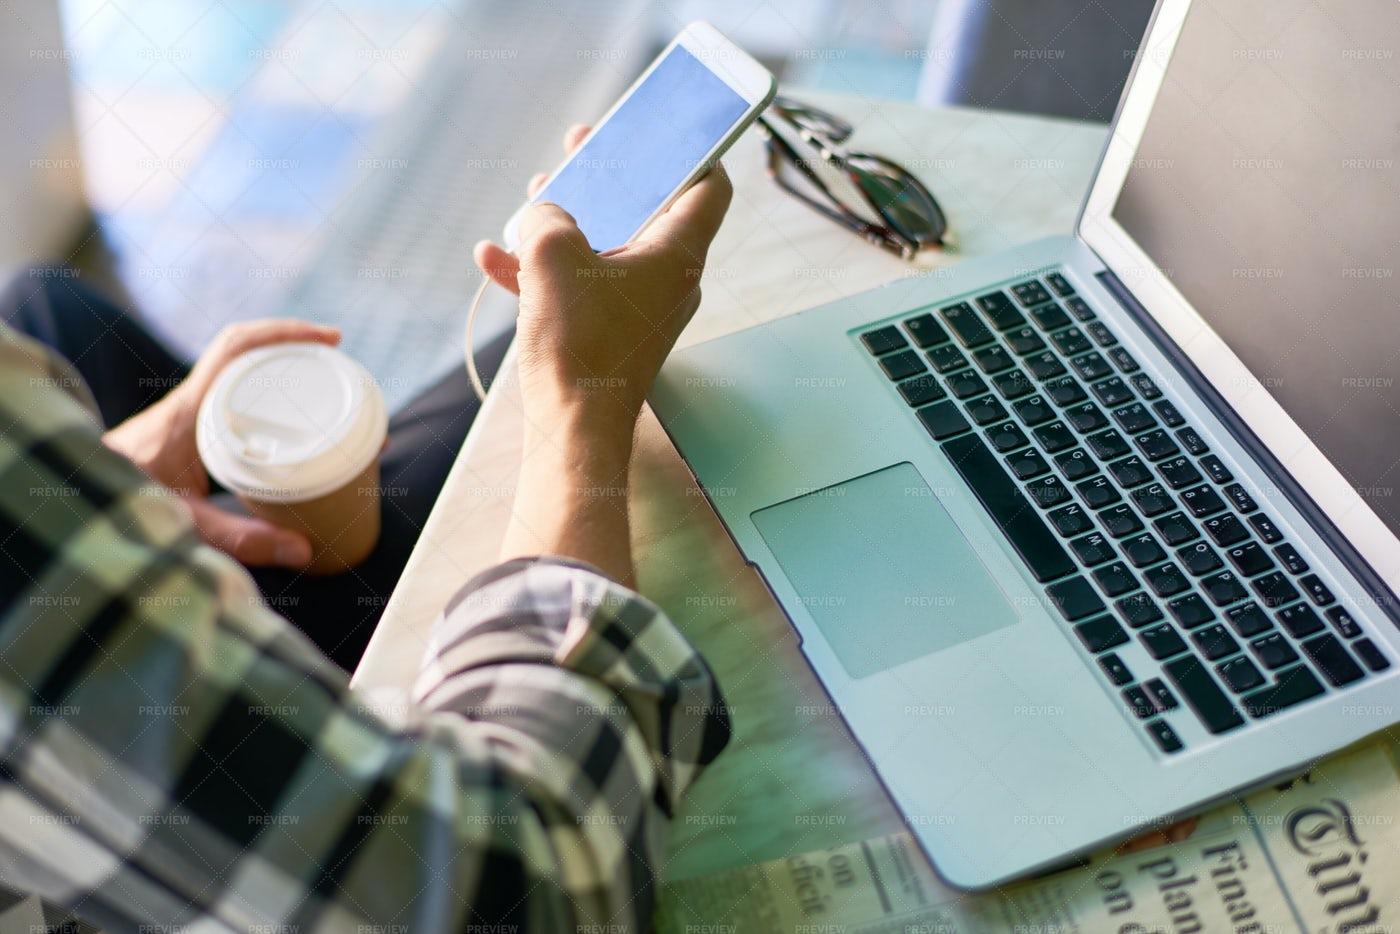 Gen Z Man Using Smartphone: Stock Photos